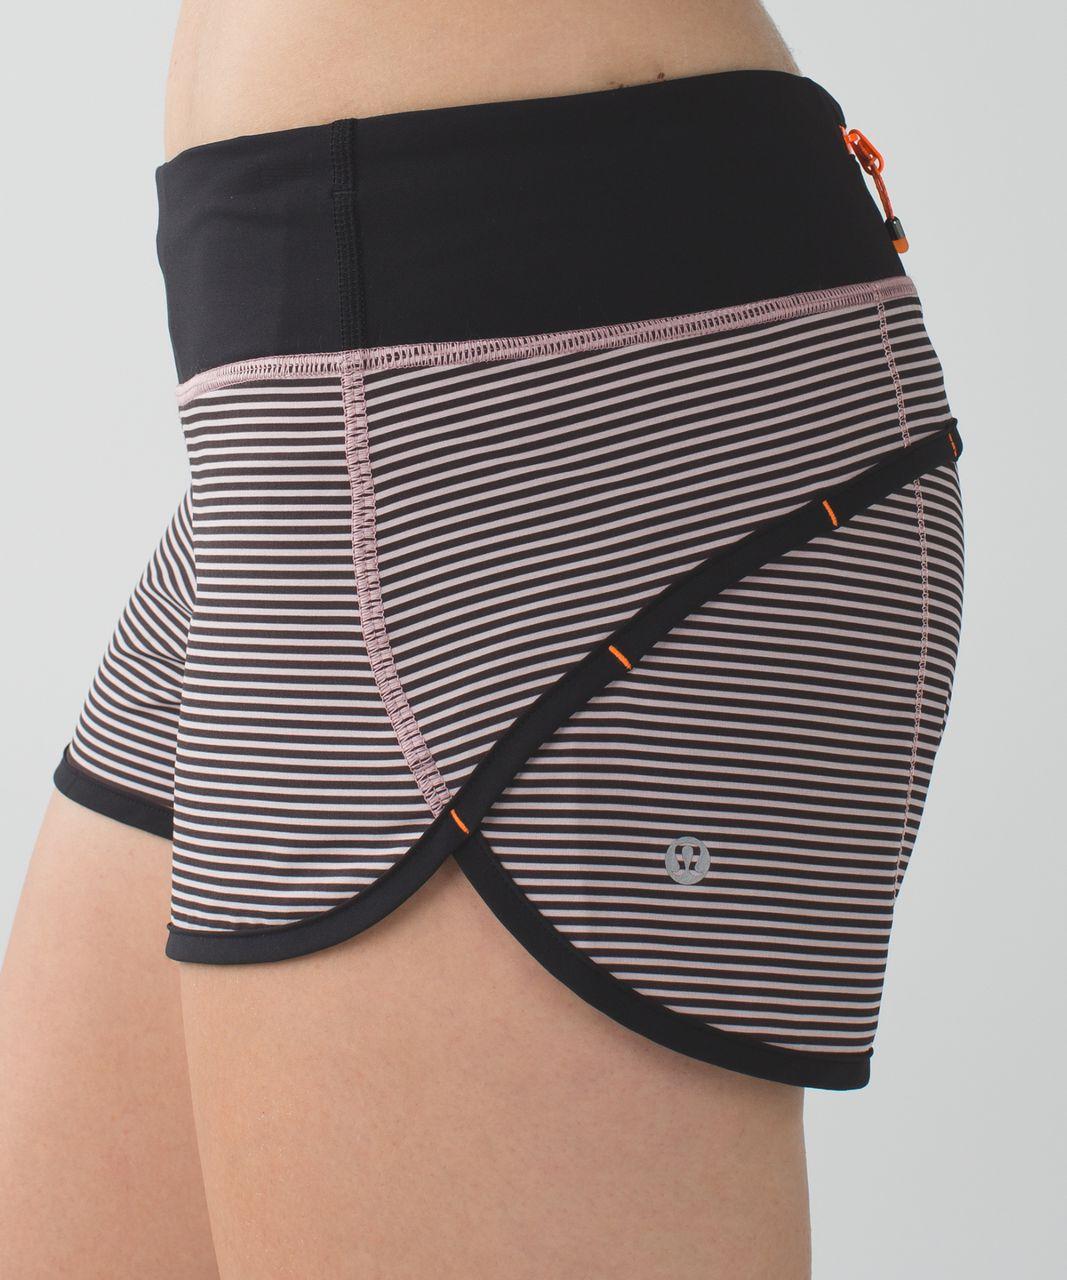 Lululemon Run:  Speed Short *4-way Stretch - Mini Pop Stripe Printed Mink Berry Black / Black